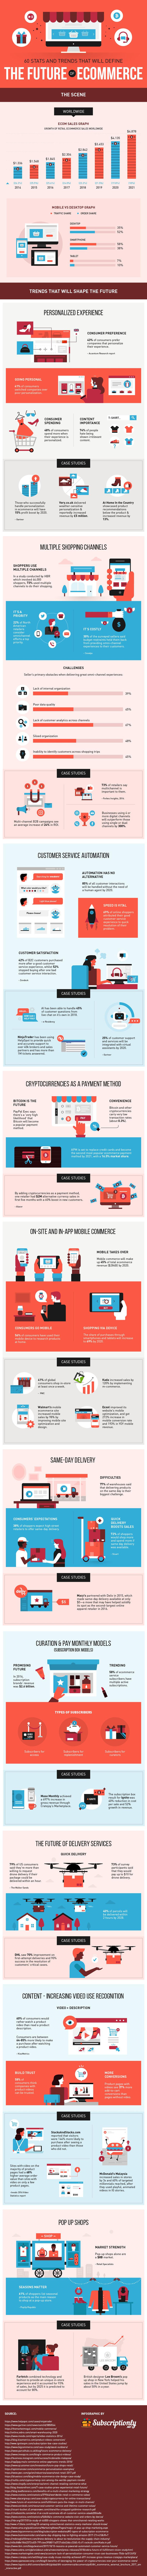 Infografía el futuro del eCommerce